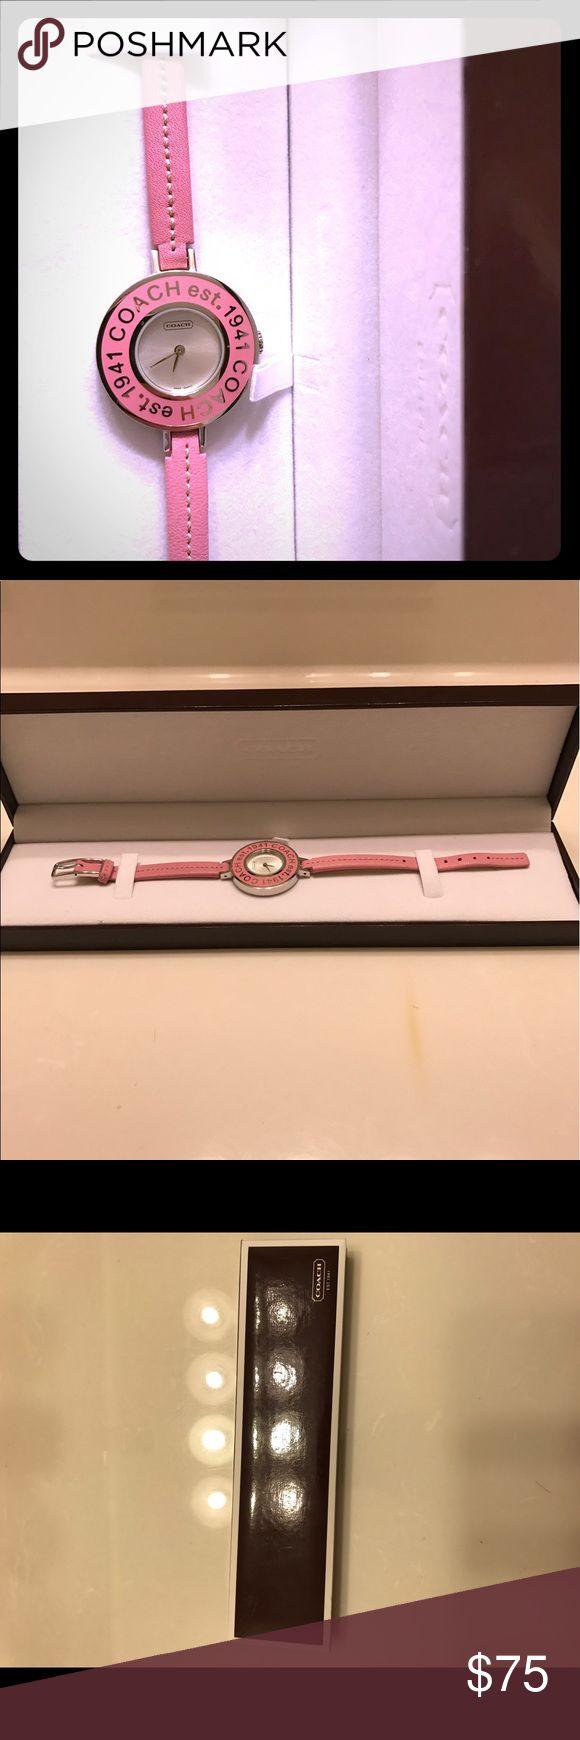 Coach watch Women's pink coach watch Coach Accessories Watches